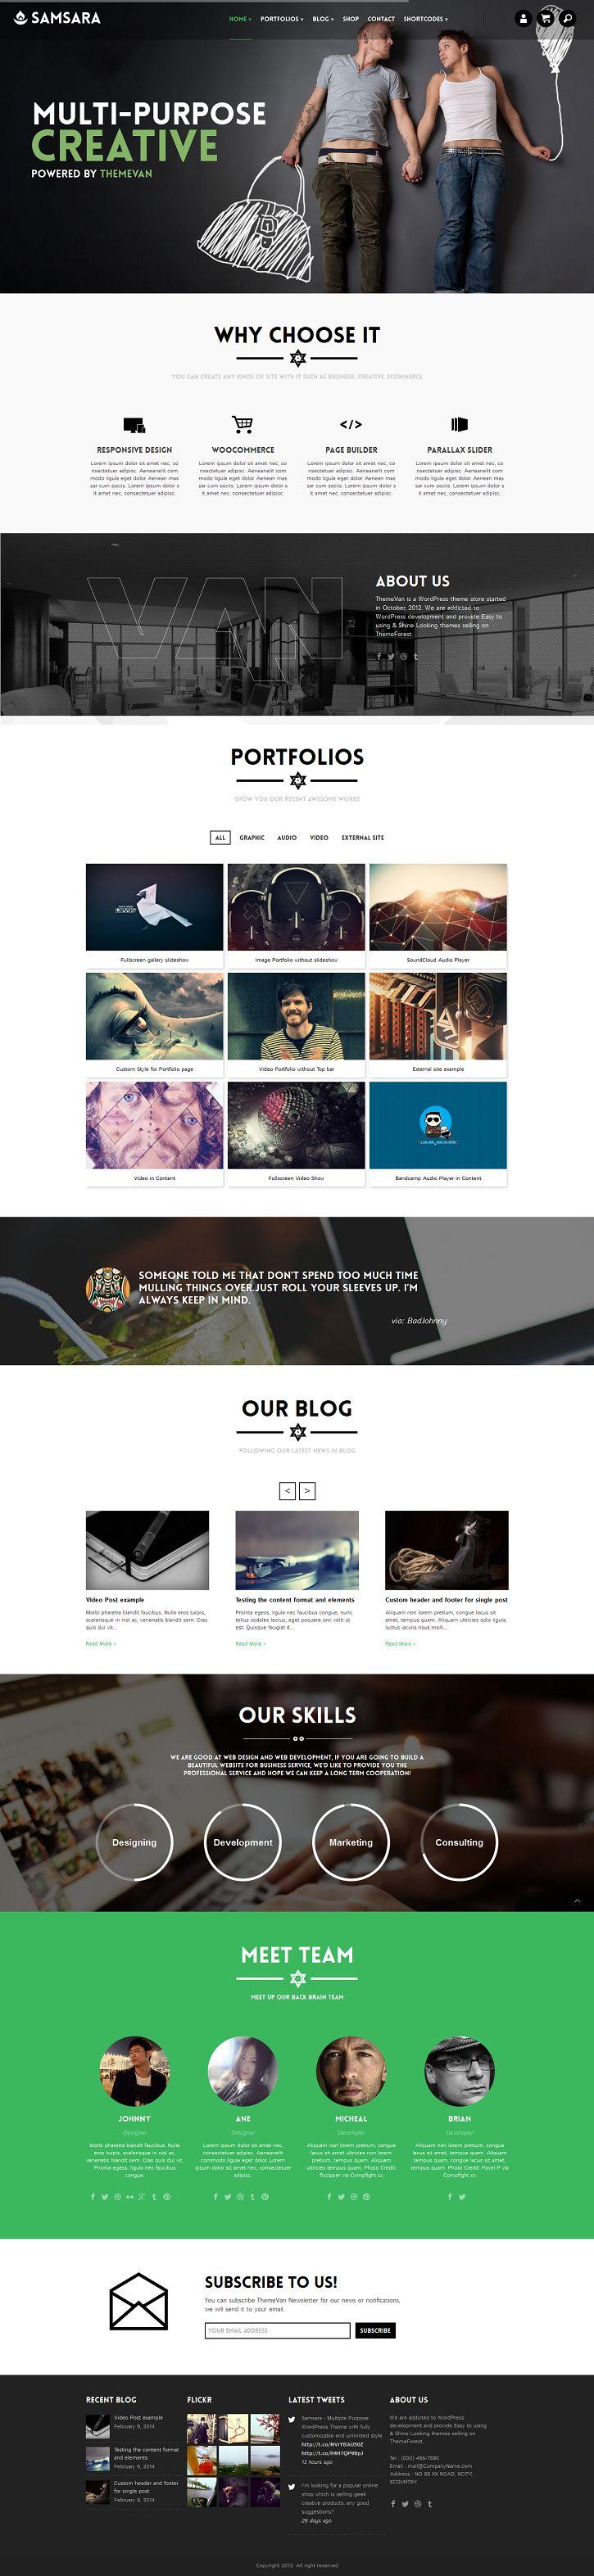 35+ BEST CreAtive Portfolio WordPress Themes of 2014 #wordpress #2014